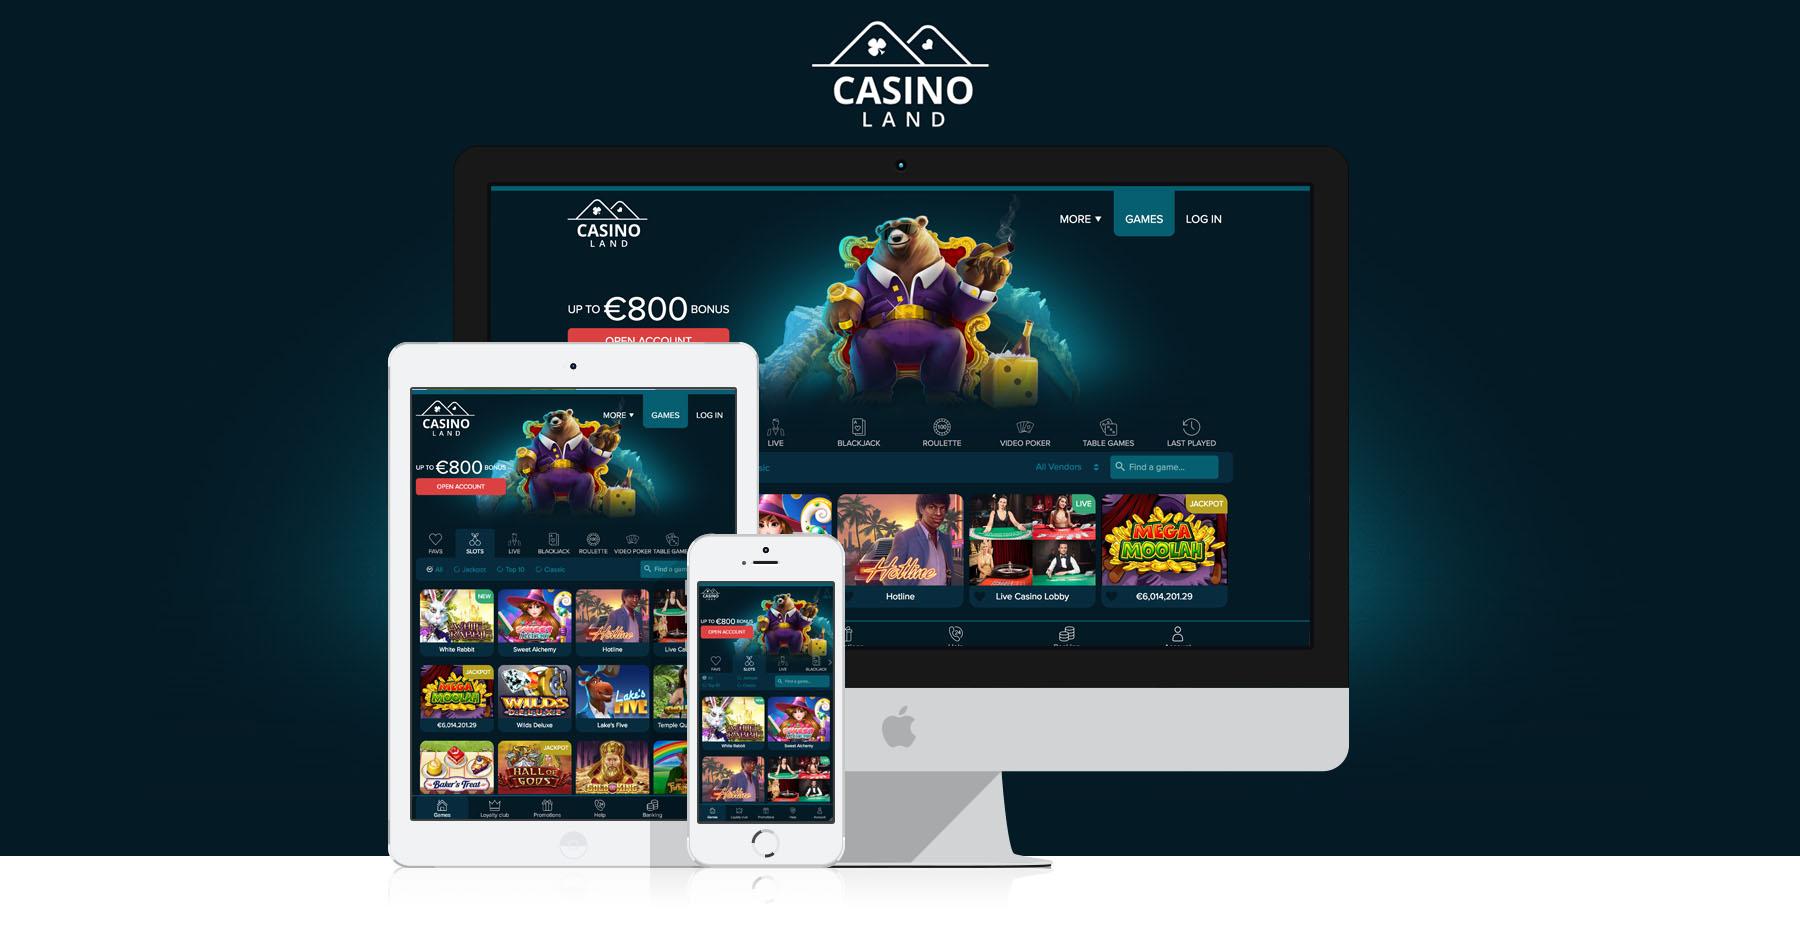 Casinoland | Casinorge